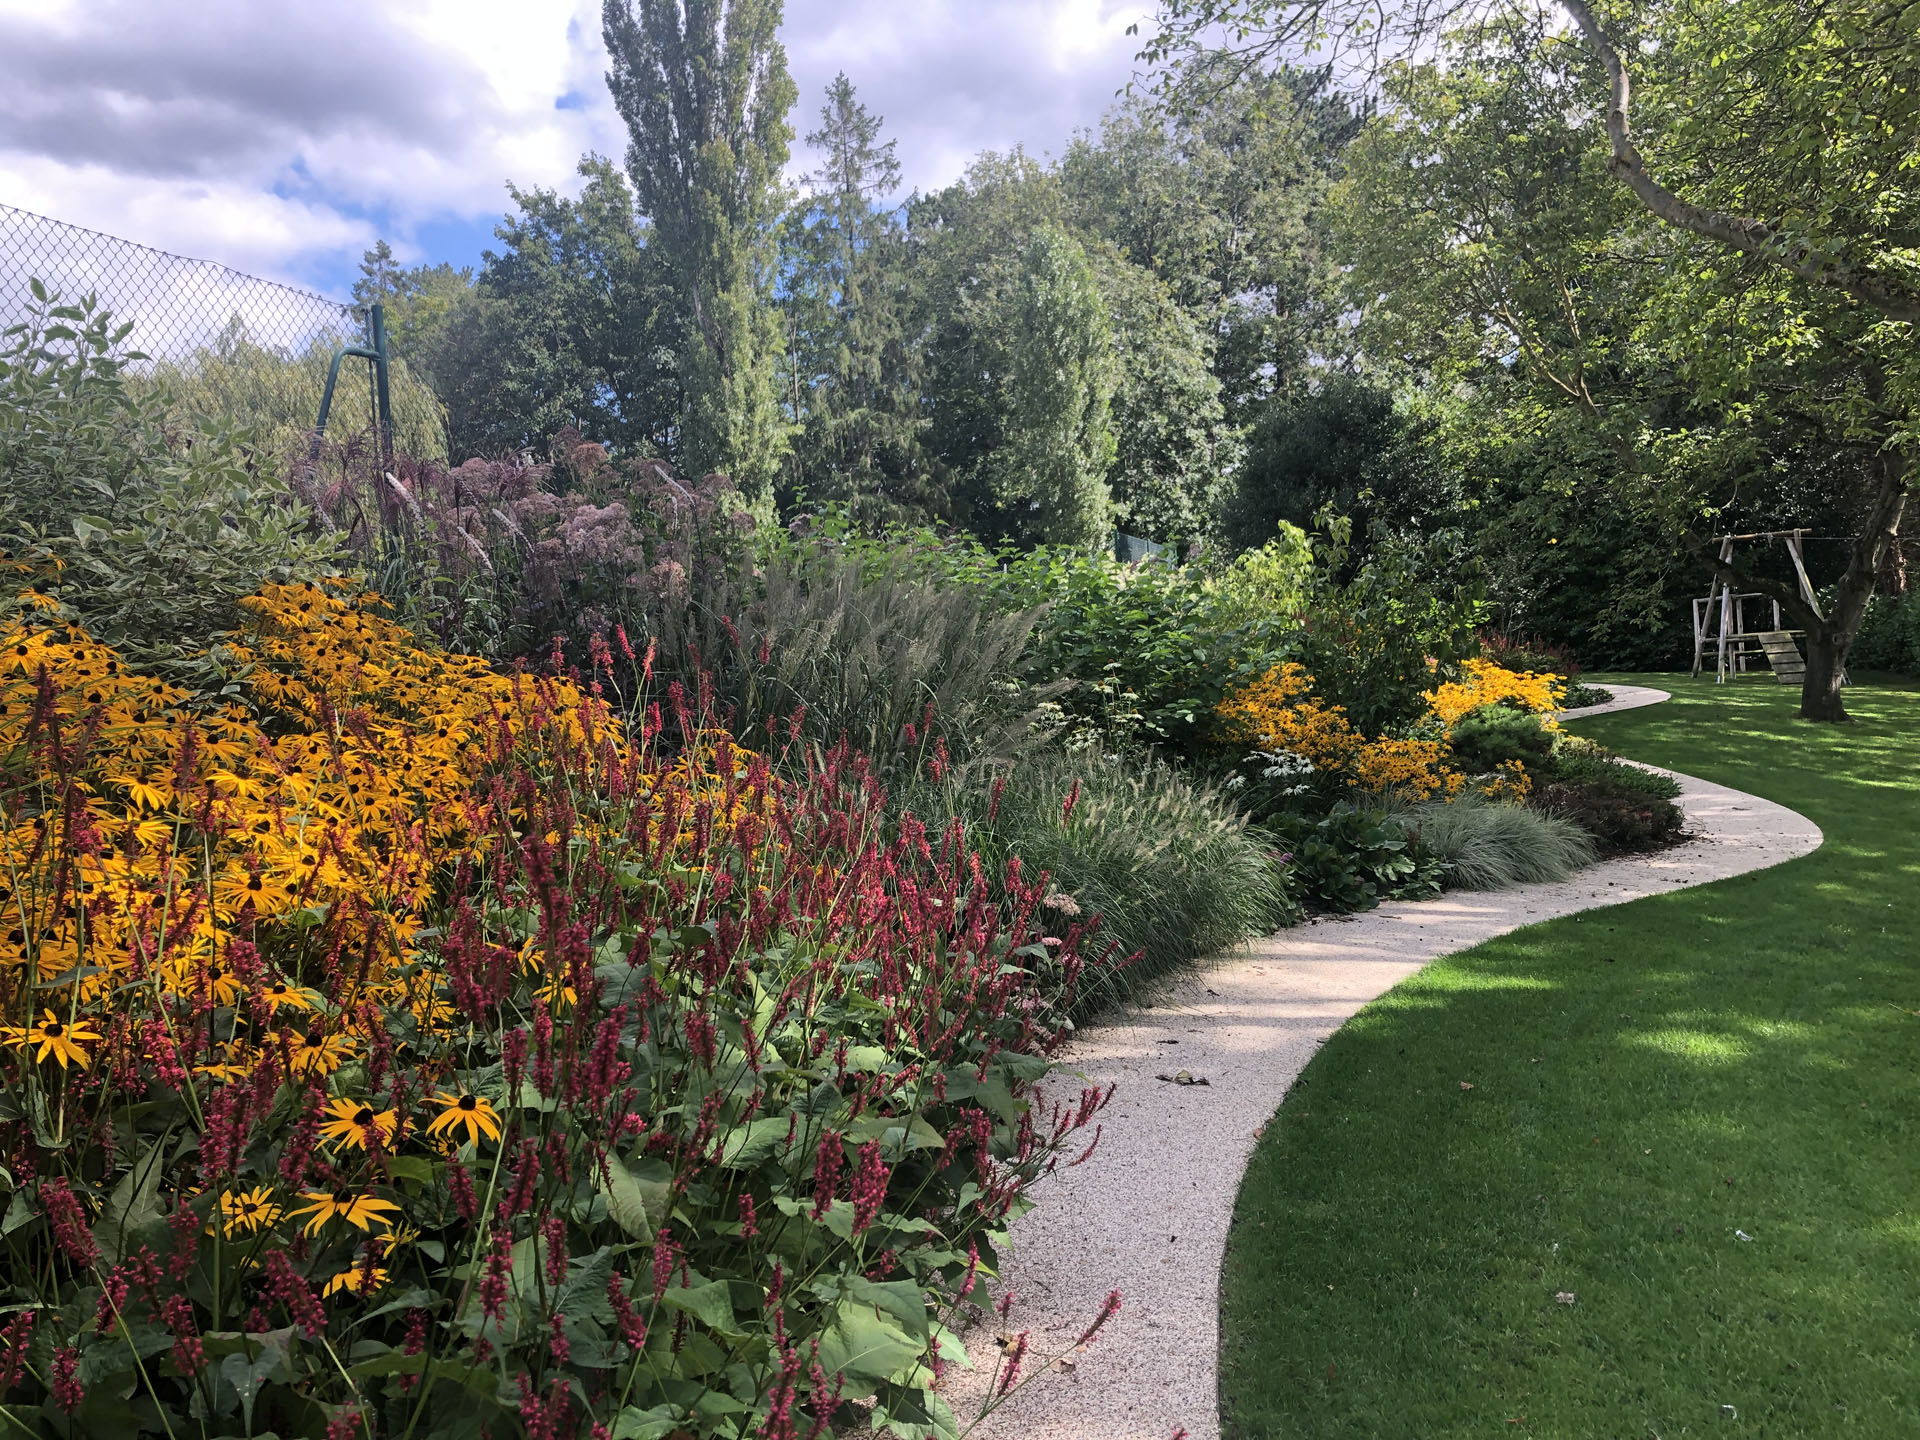 Full Vibrant Planting on winding path, London